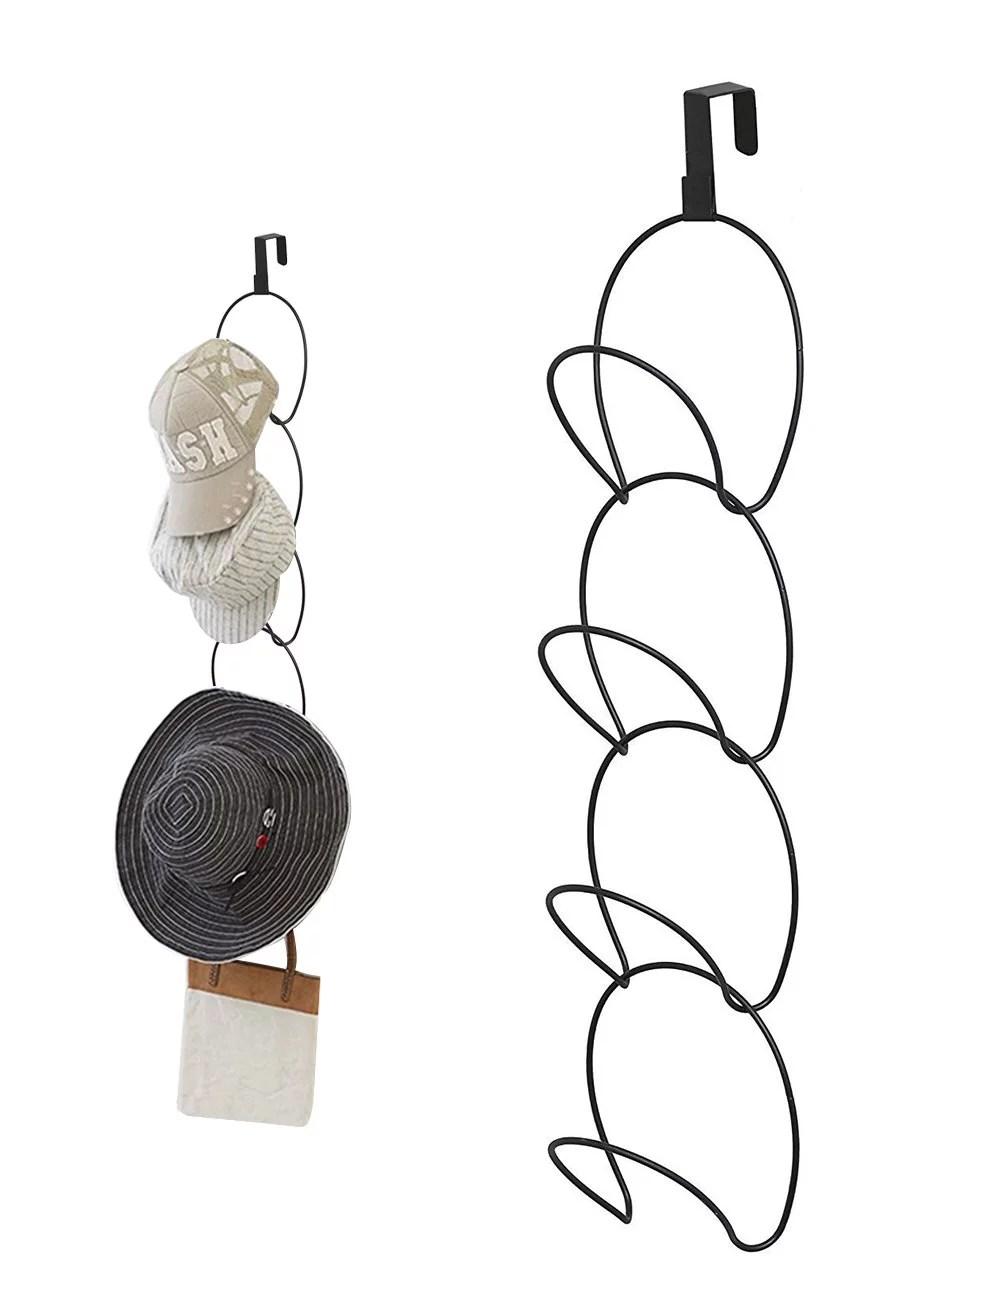 yoassi metal cap rack wall mounted over door hat rack baseball cap holder organizer hooks hanging storage for scarf clothes towels ties caps